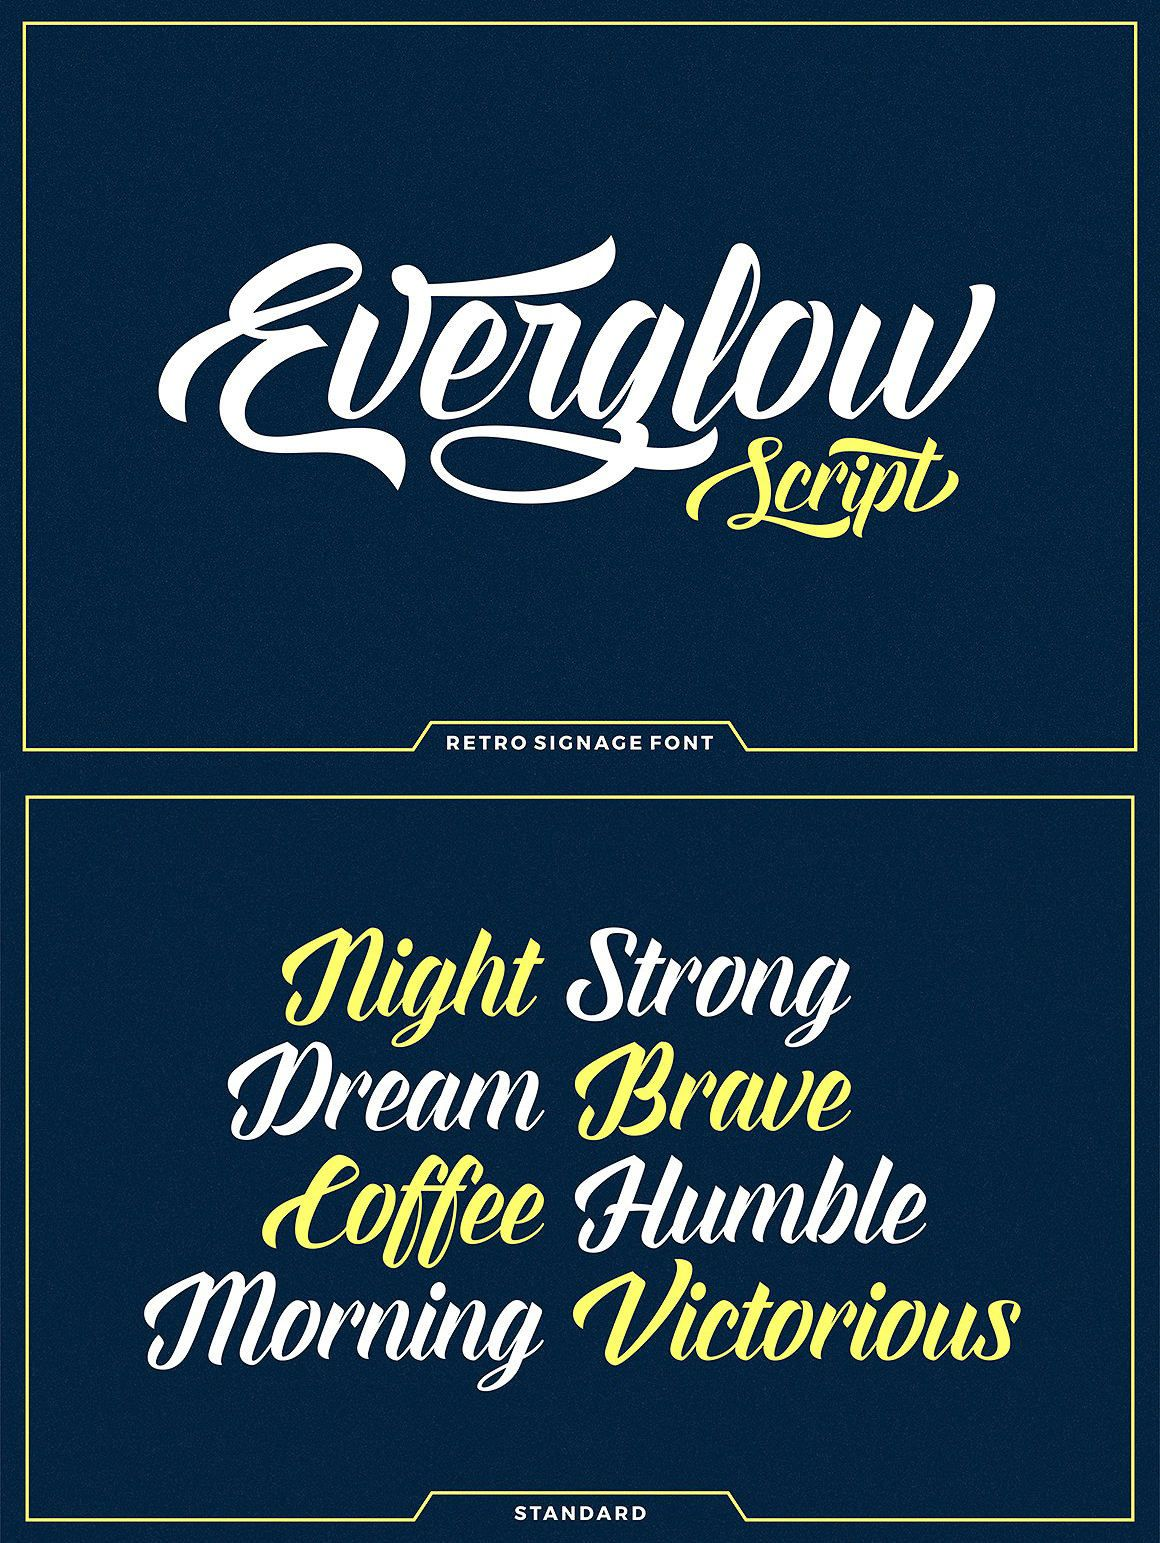 Everglow Script Retro Font Calligraphy Font Brush Font Classic